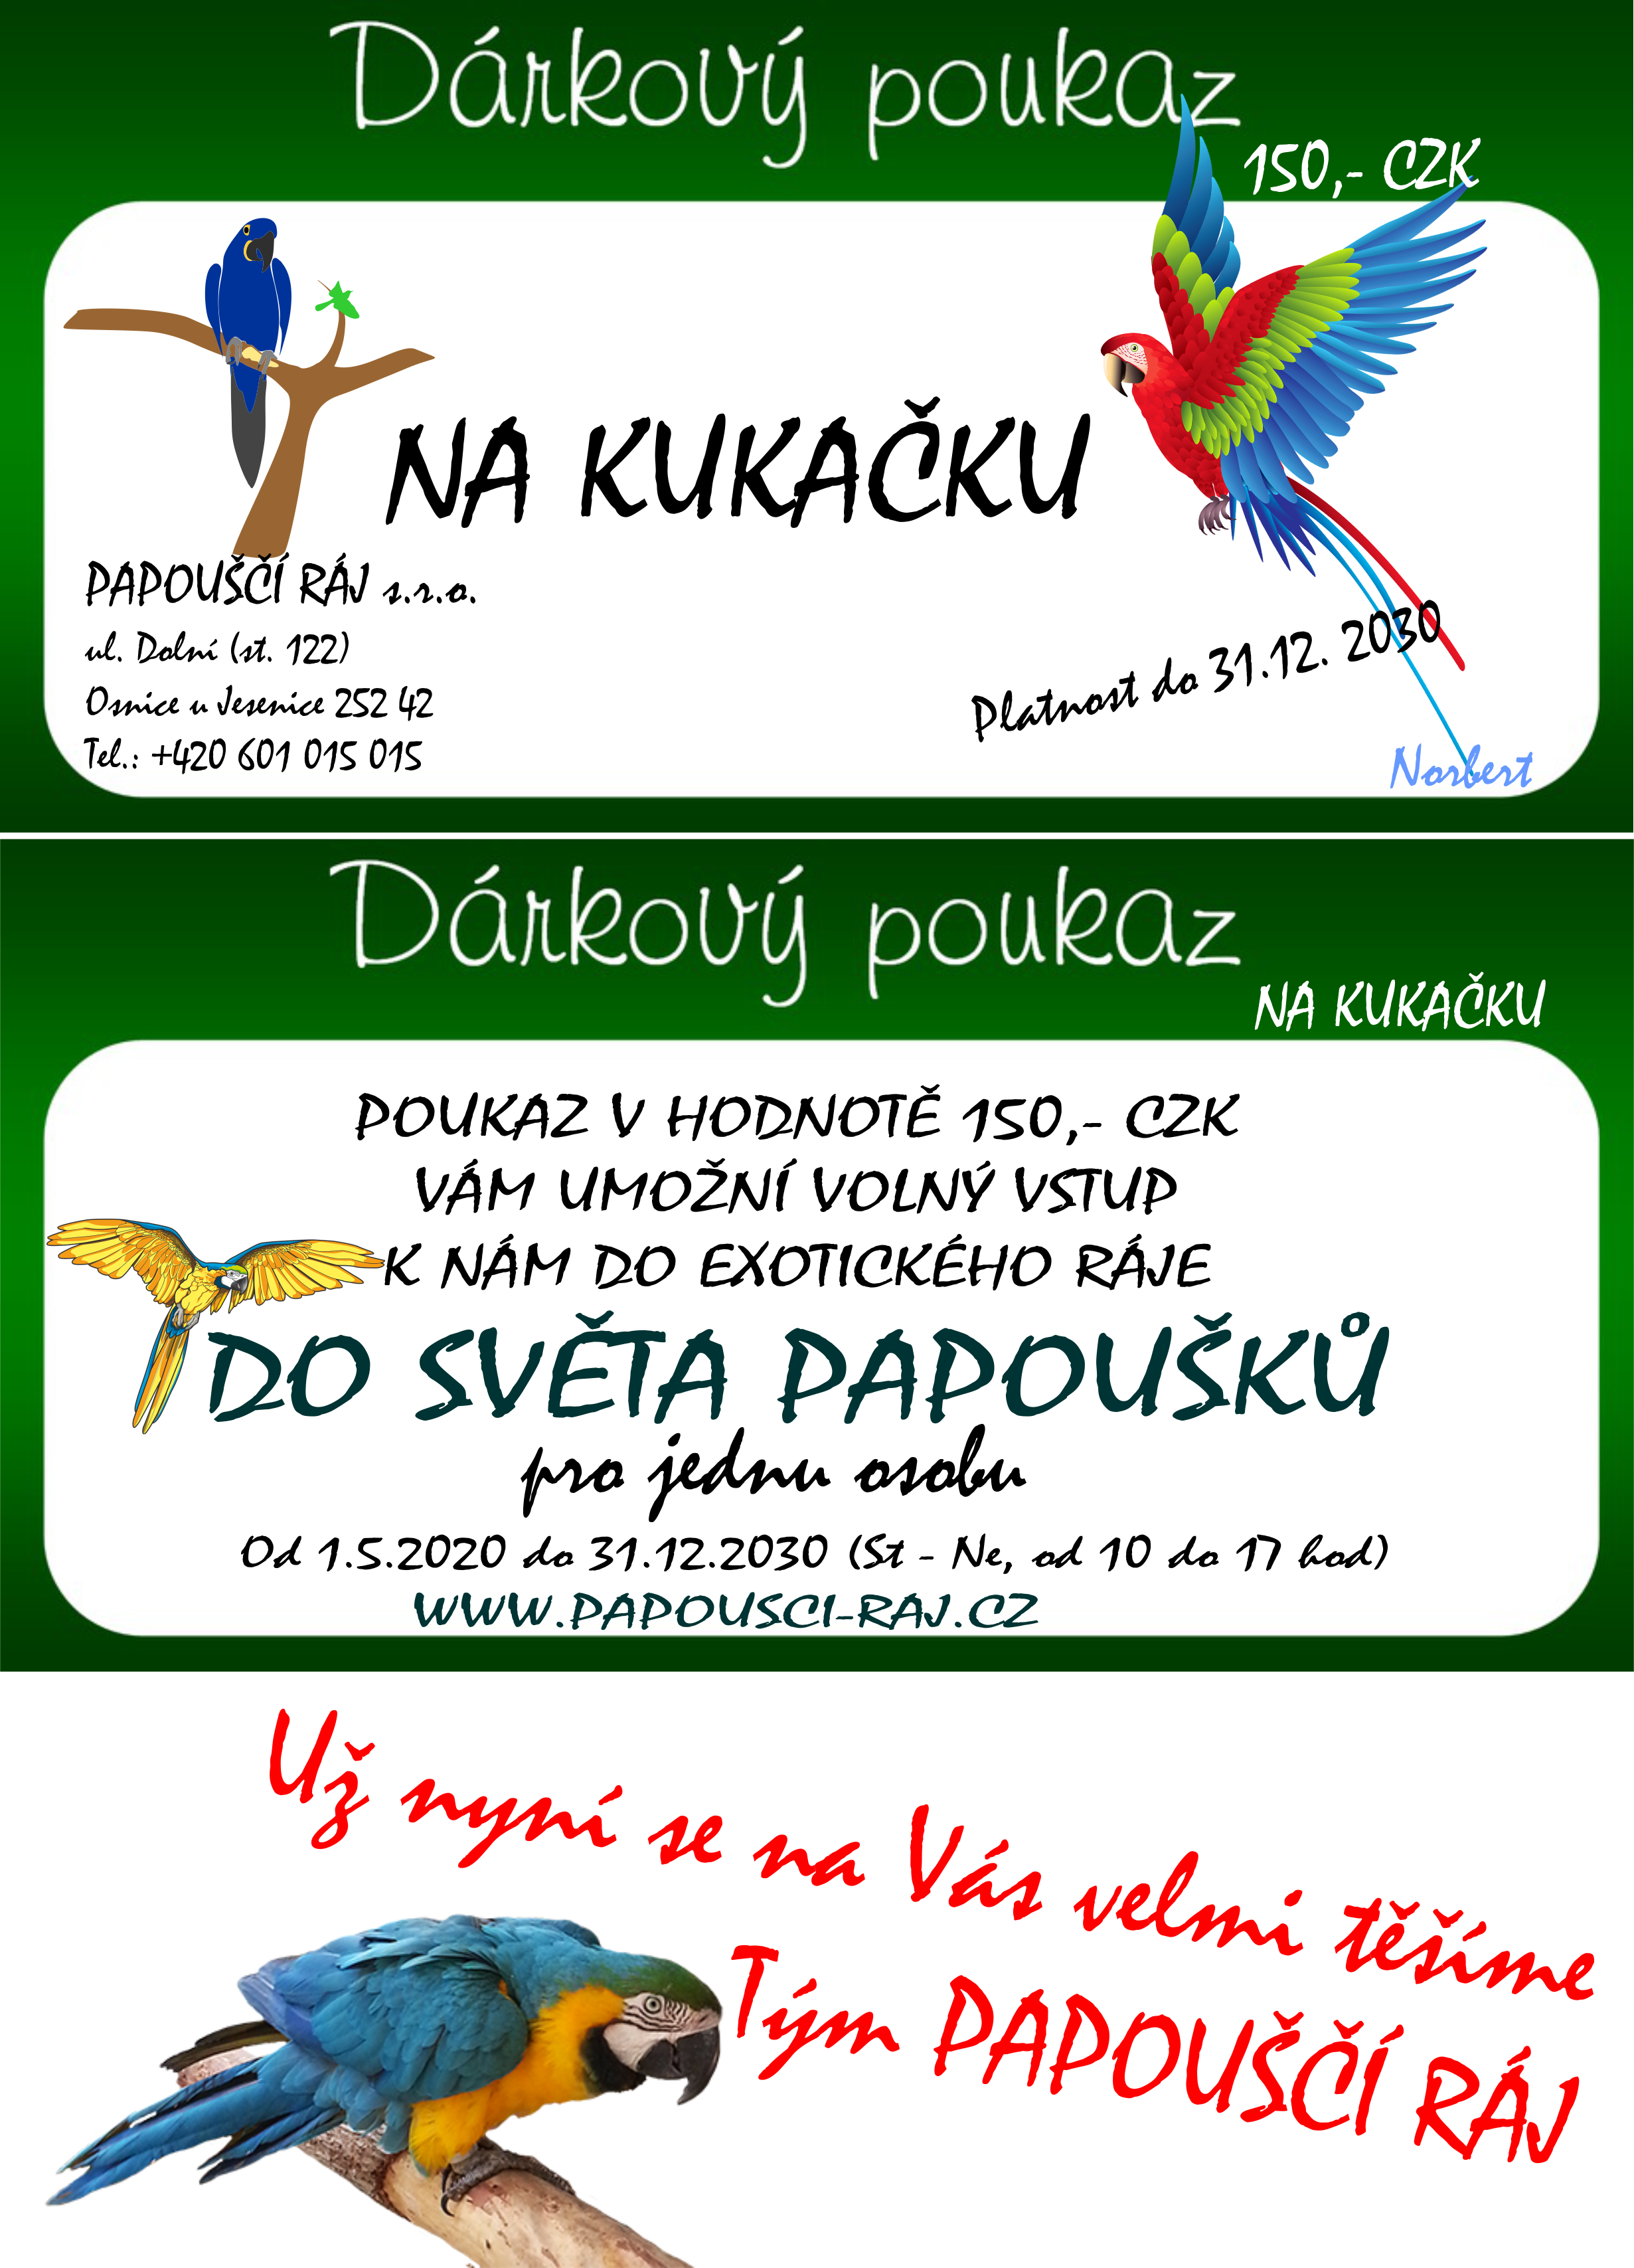 NA_KUKACKU